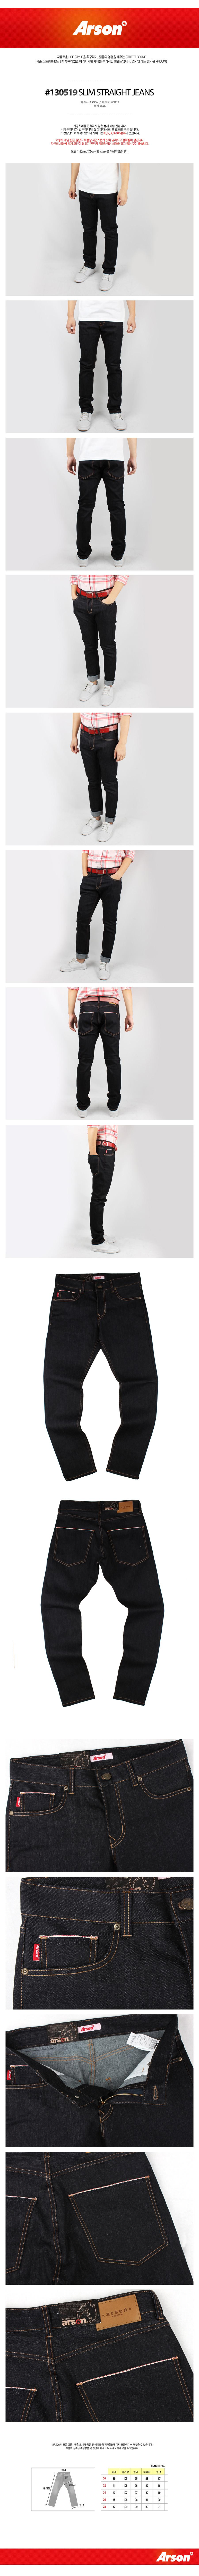 [ ARSON ] [Arson] ARSON GENUINE/ARSON 130519 SLIM STRAIGHT JEANS/men\'s jeans/jeans/ARSON jeans